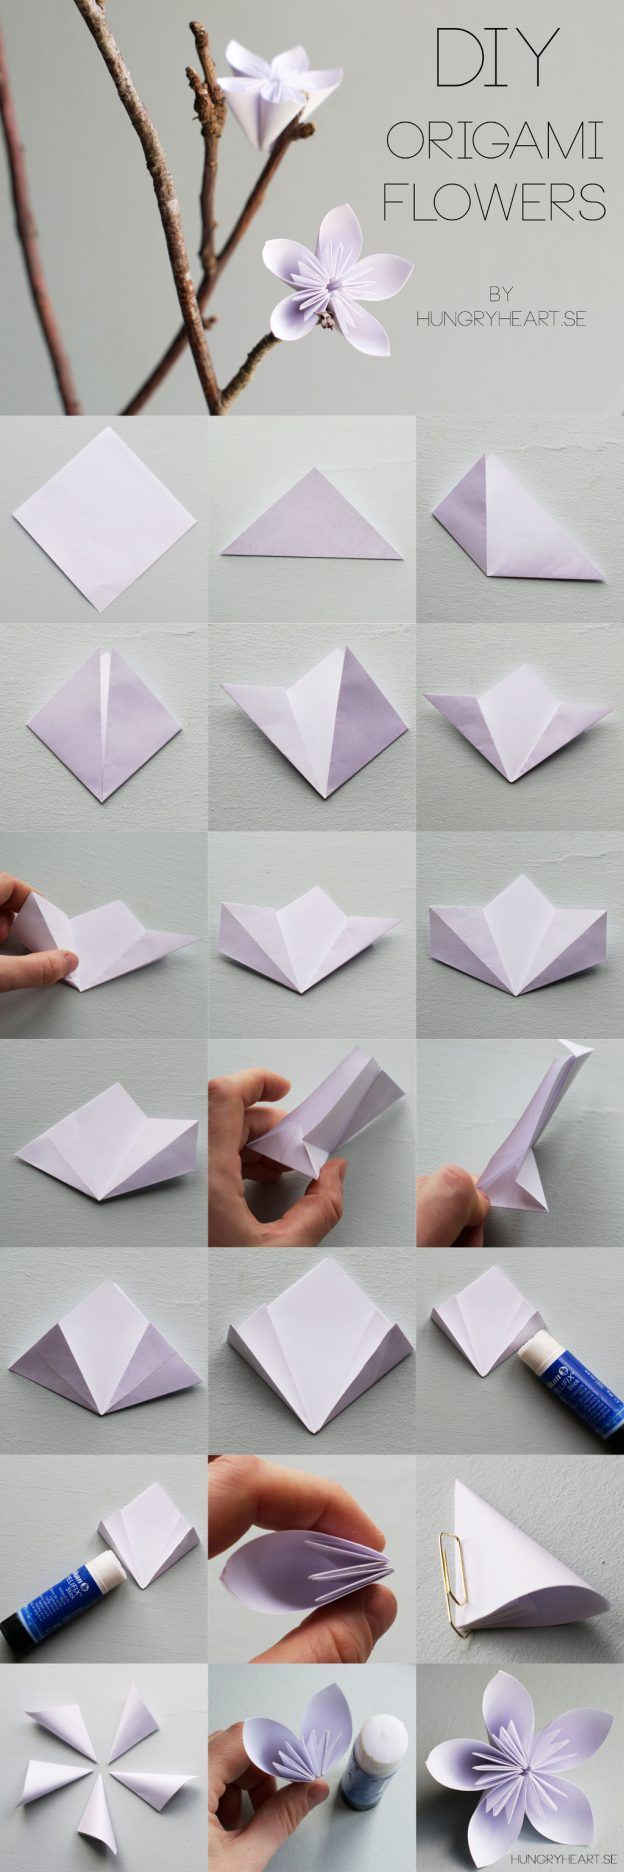 Diy origami flower step by step tutorial hungryheart fjongo diy origami flower step by step tutorial hungryheart izmirmasajfo